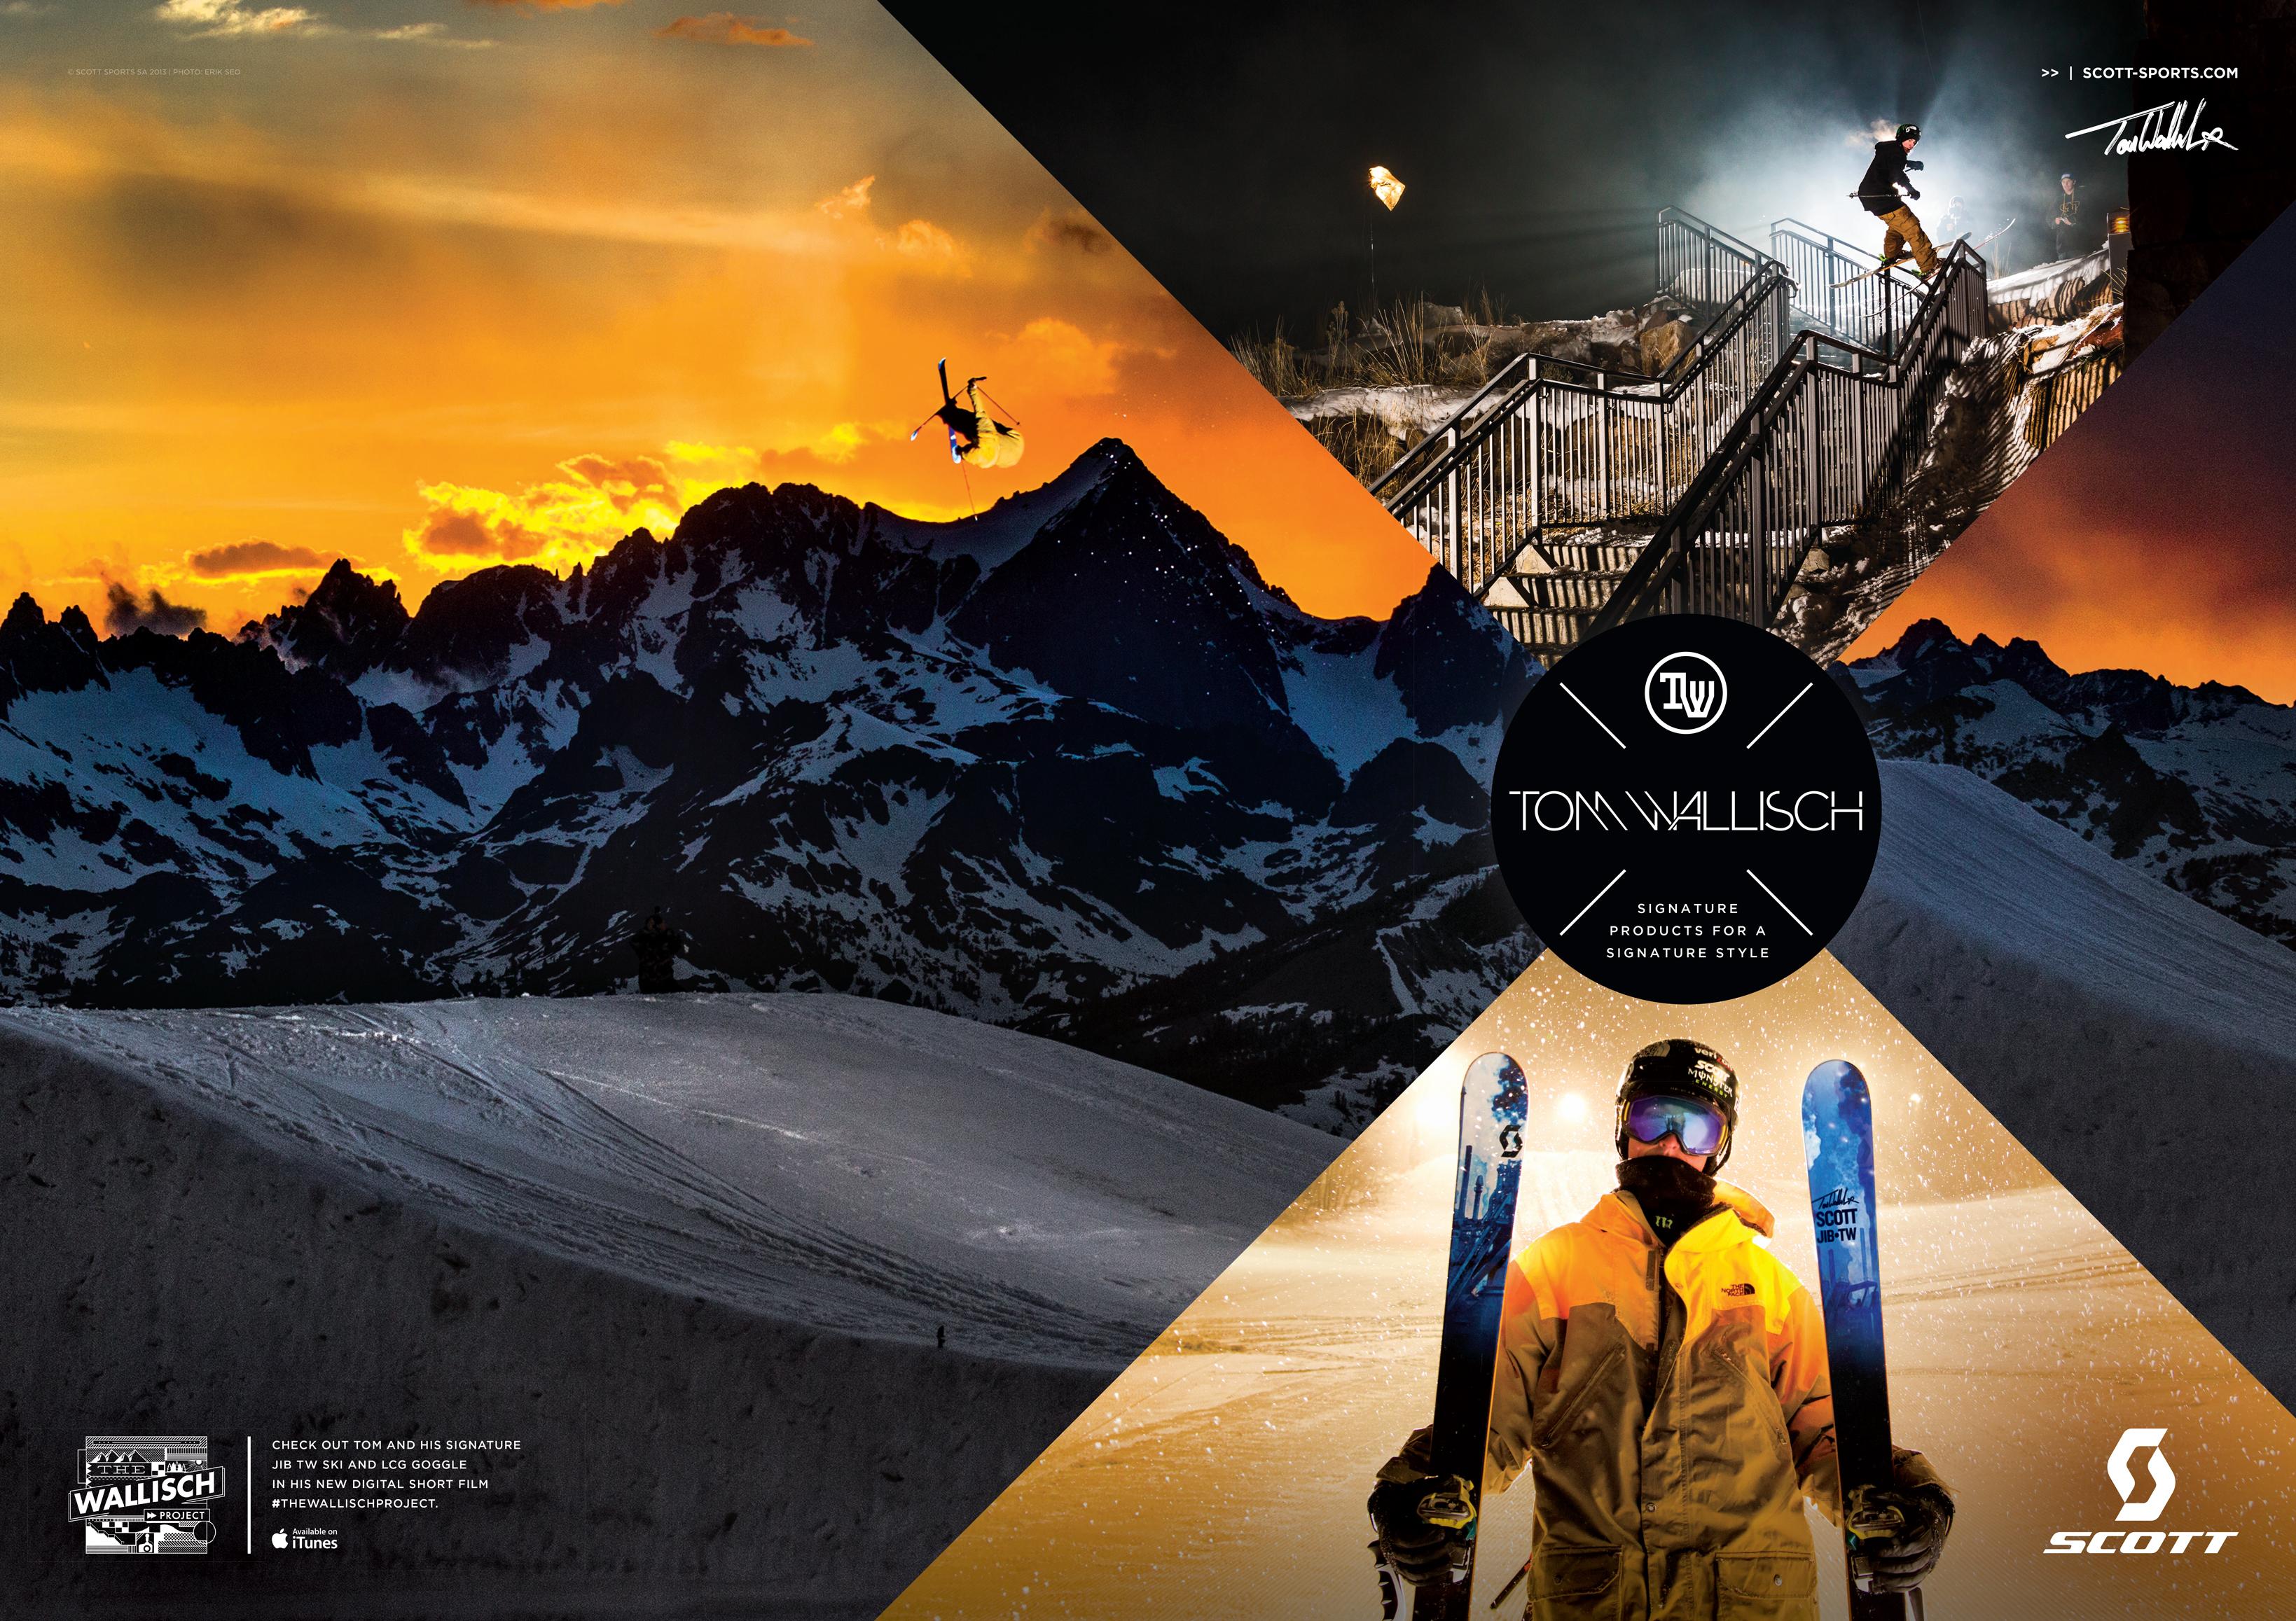 TomWallisch_841x594_Poster_2014_WINTERSPORTS_SCOTT-Sports_EN.jpg